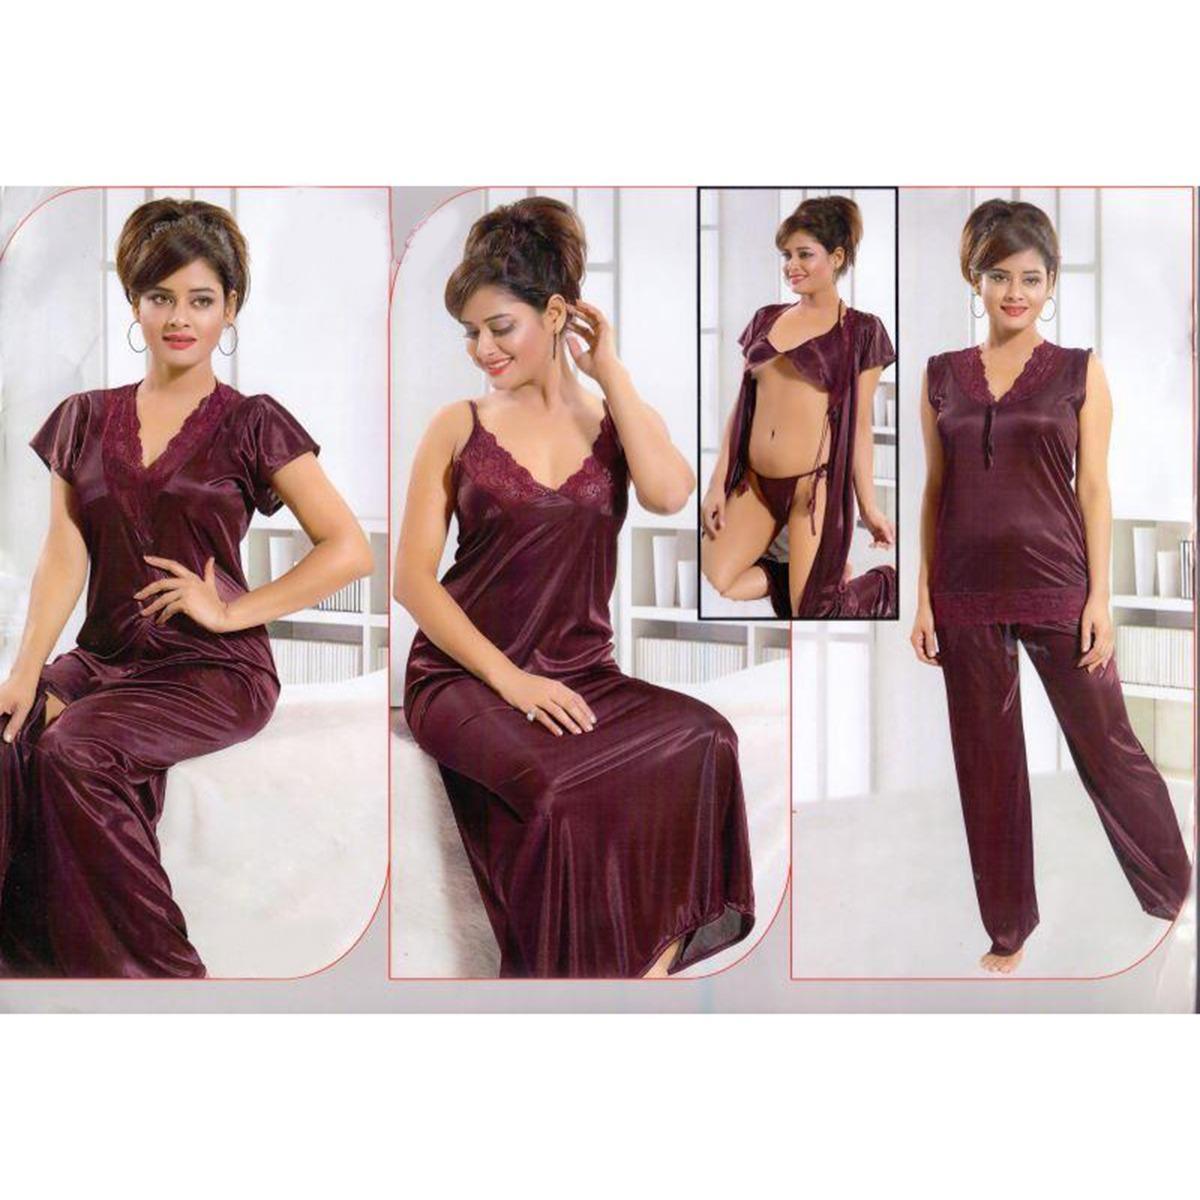 9183892fe4 Nighty Price In Bangladesh - Buy Ladies Night Dress from Daraz.com.bd